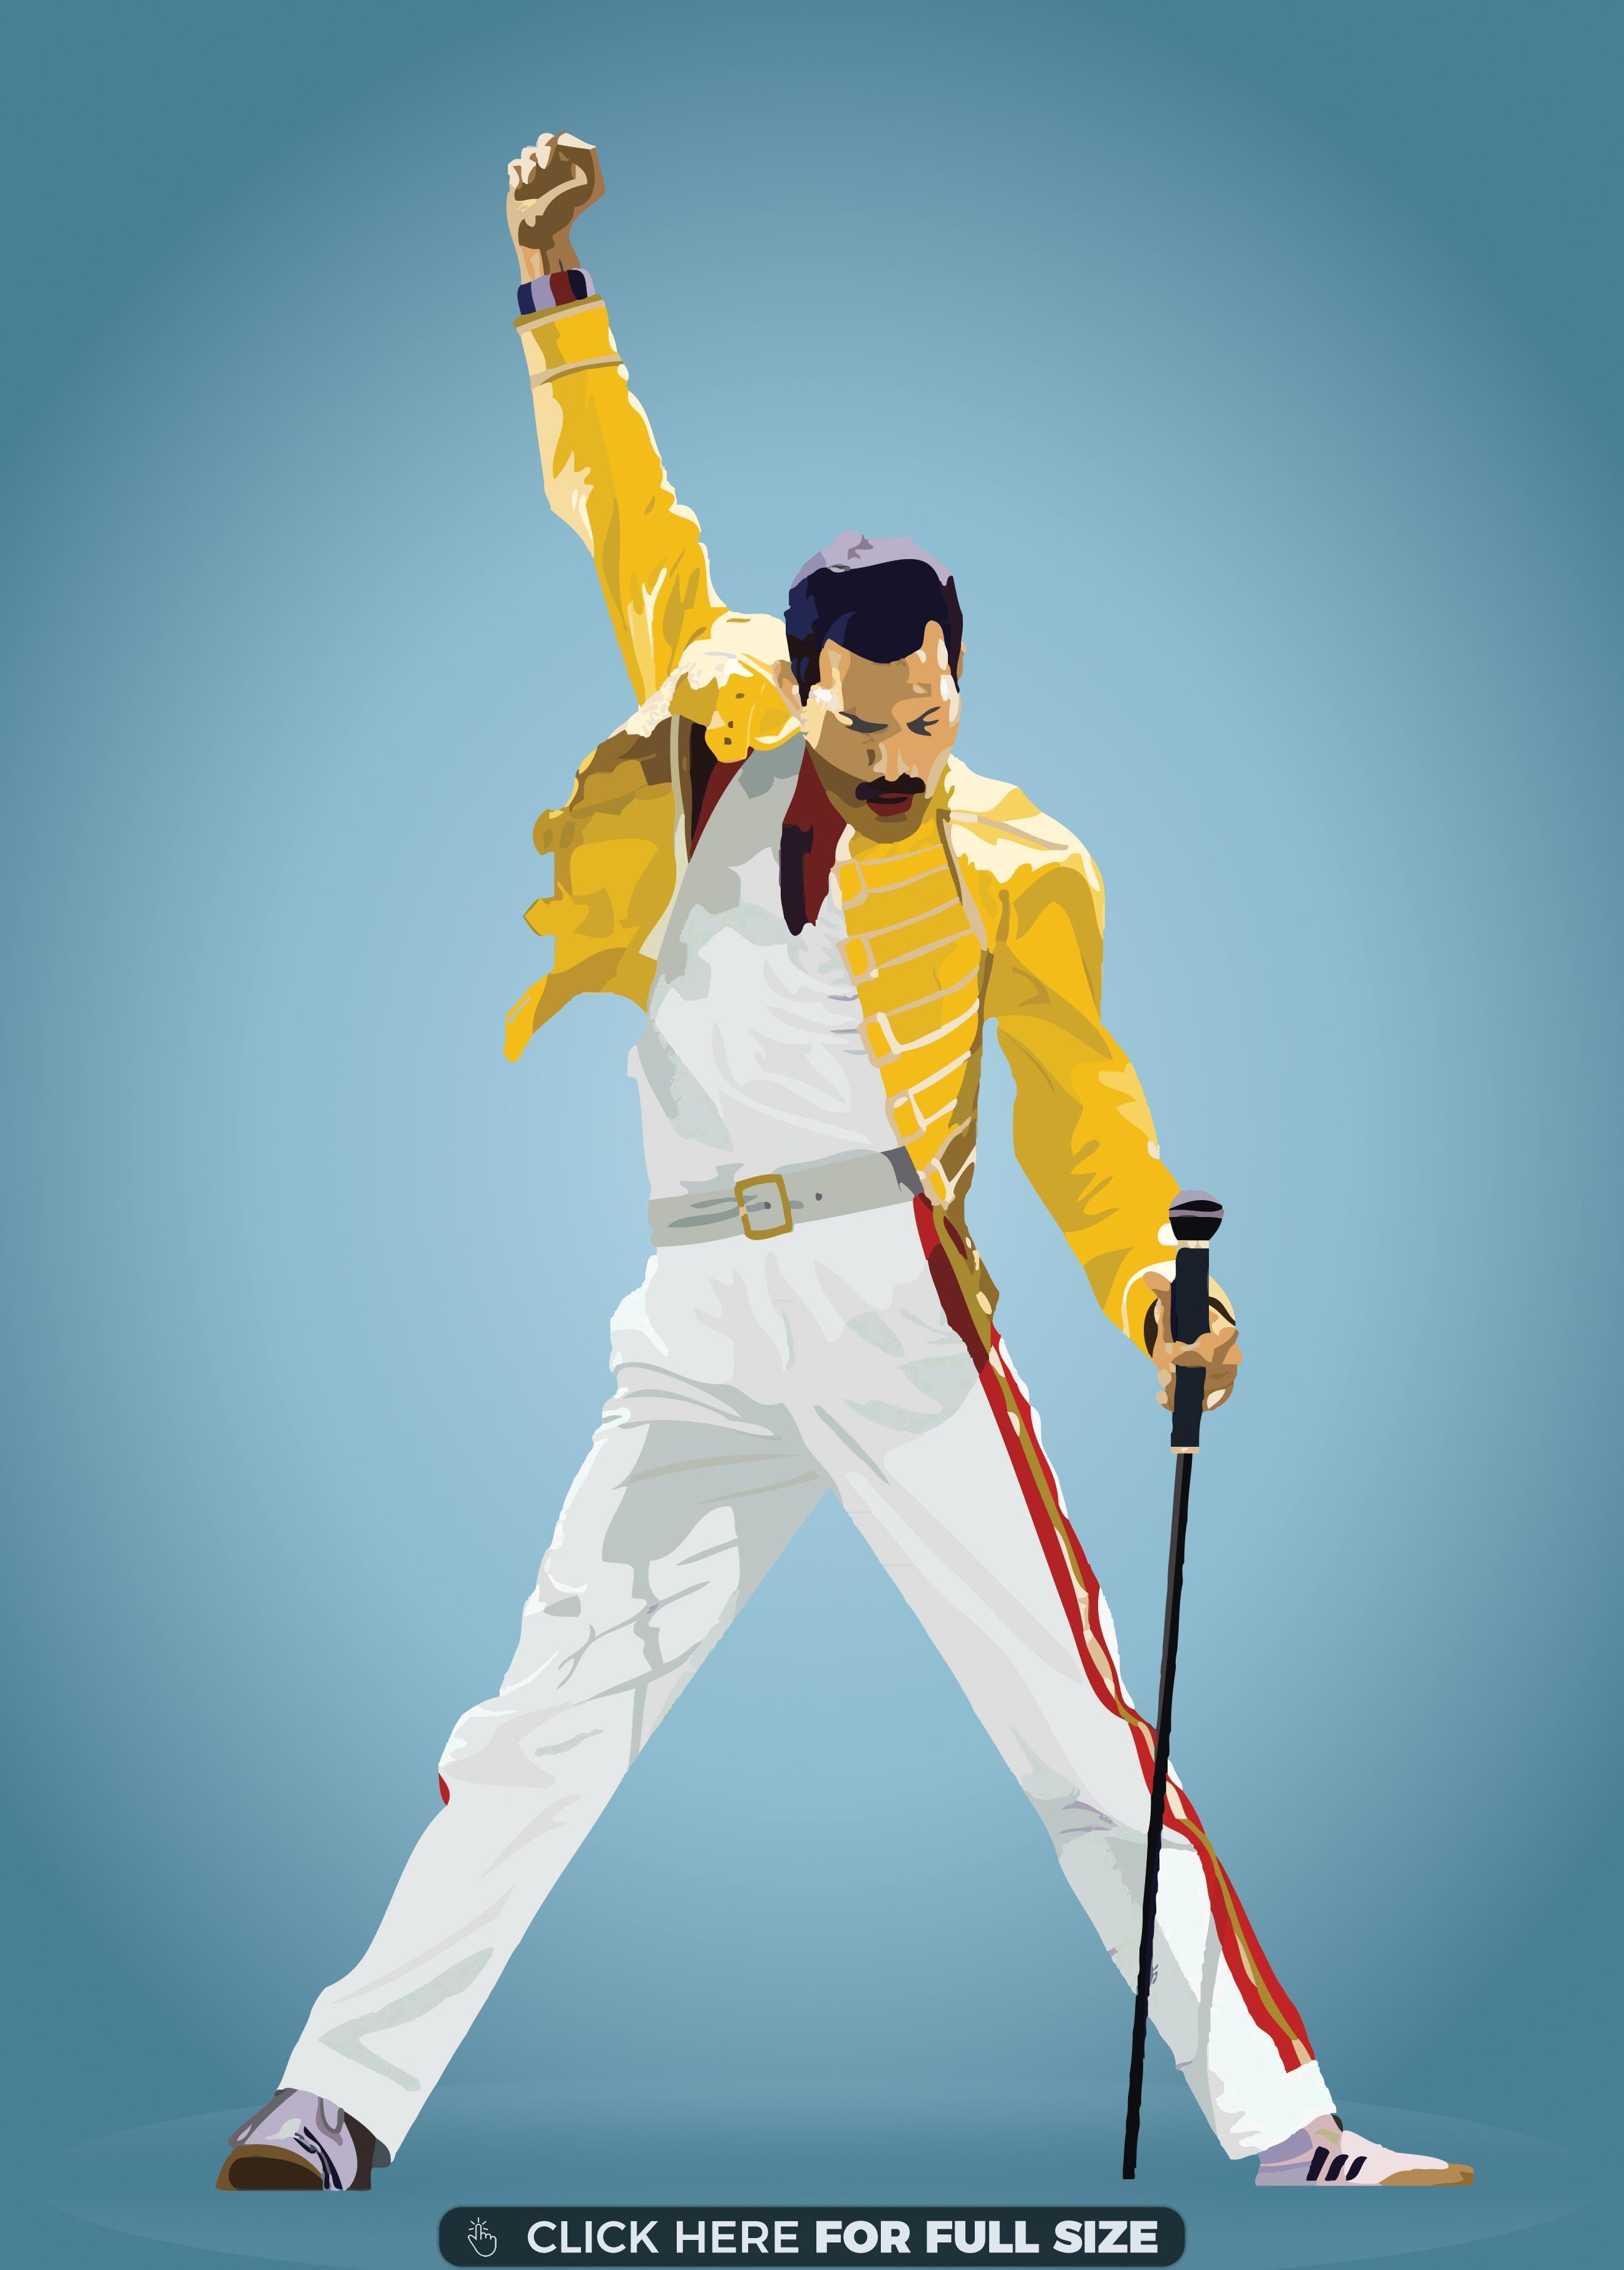 He Is The Champion Freddie Mercury Hd Wallpaper Freddie Mercury Tattoo Freddie Mercury Queen Drawing